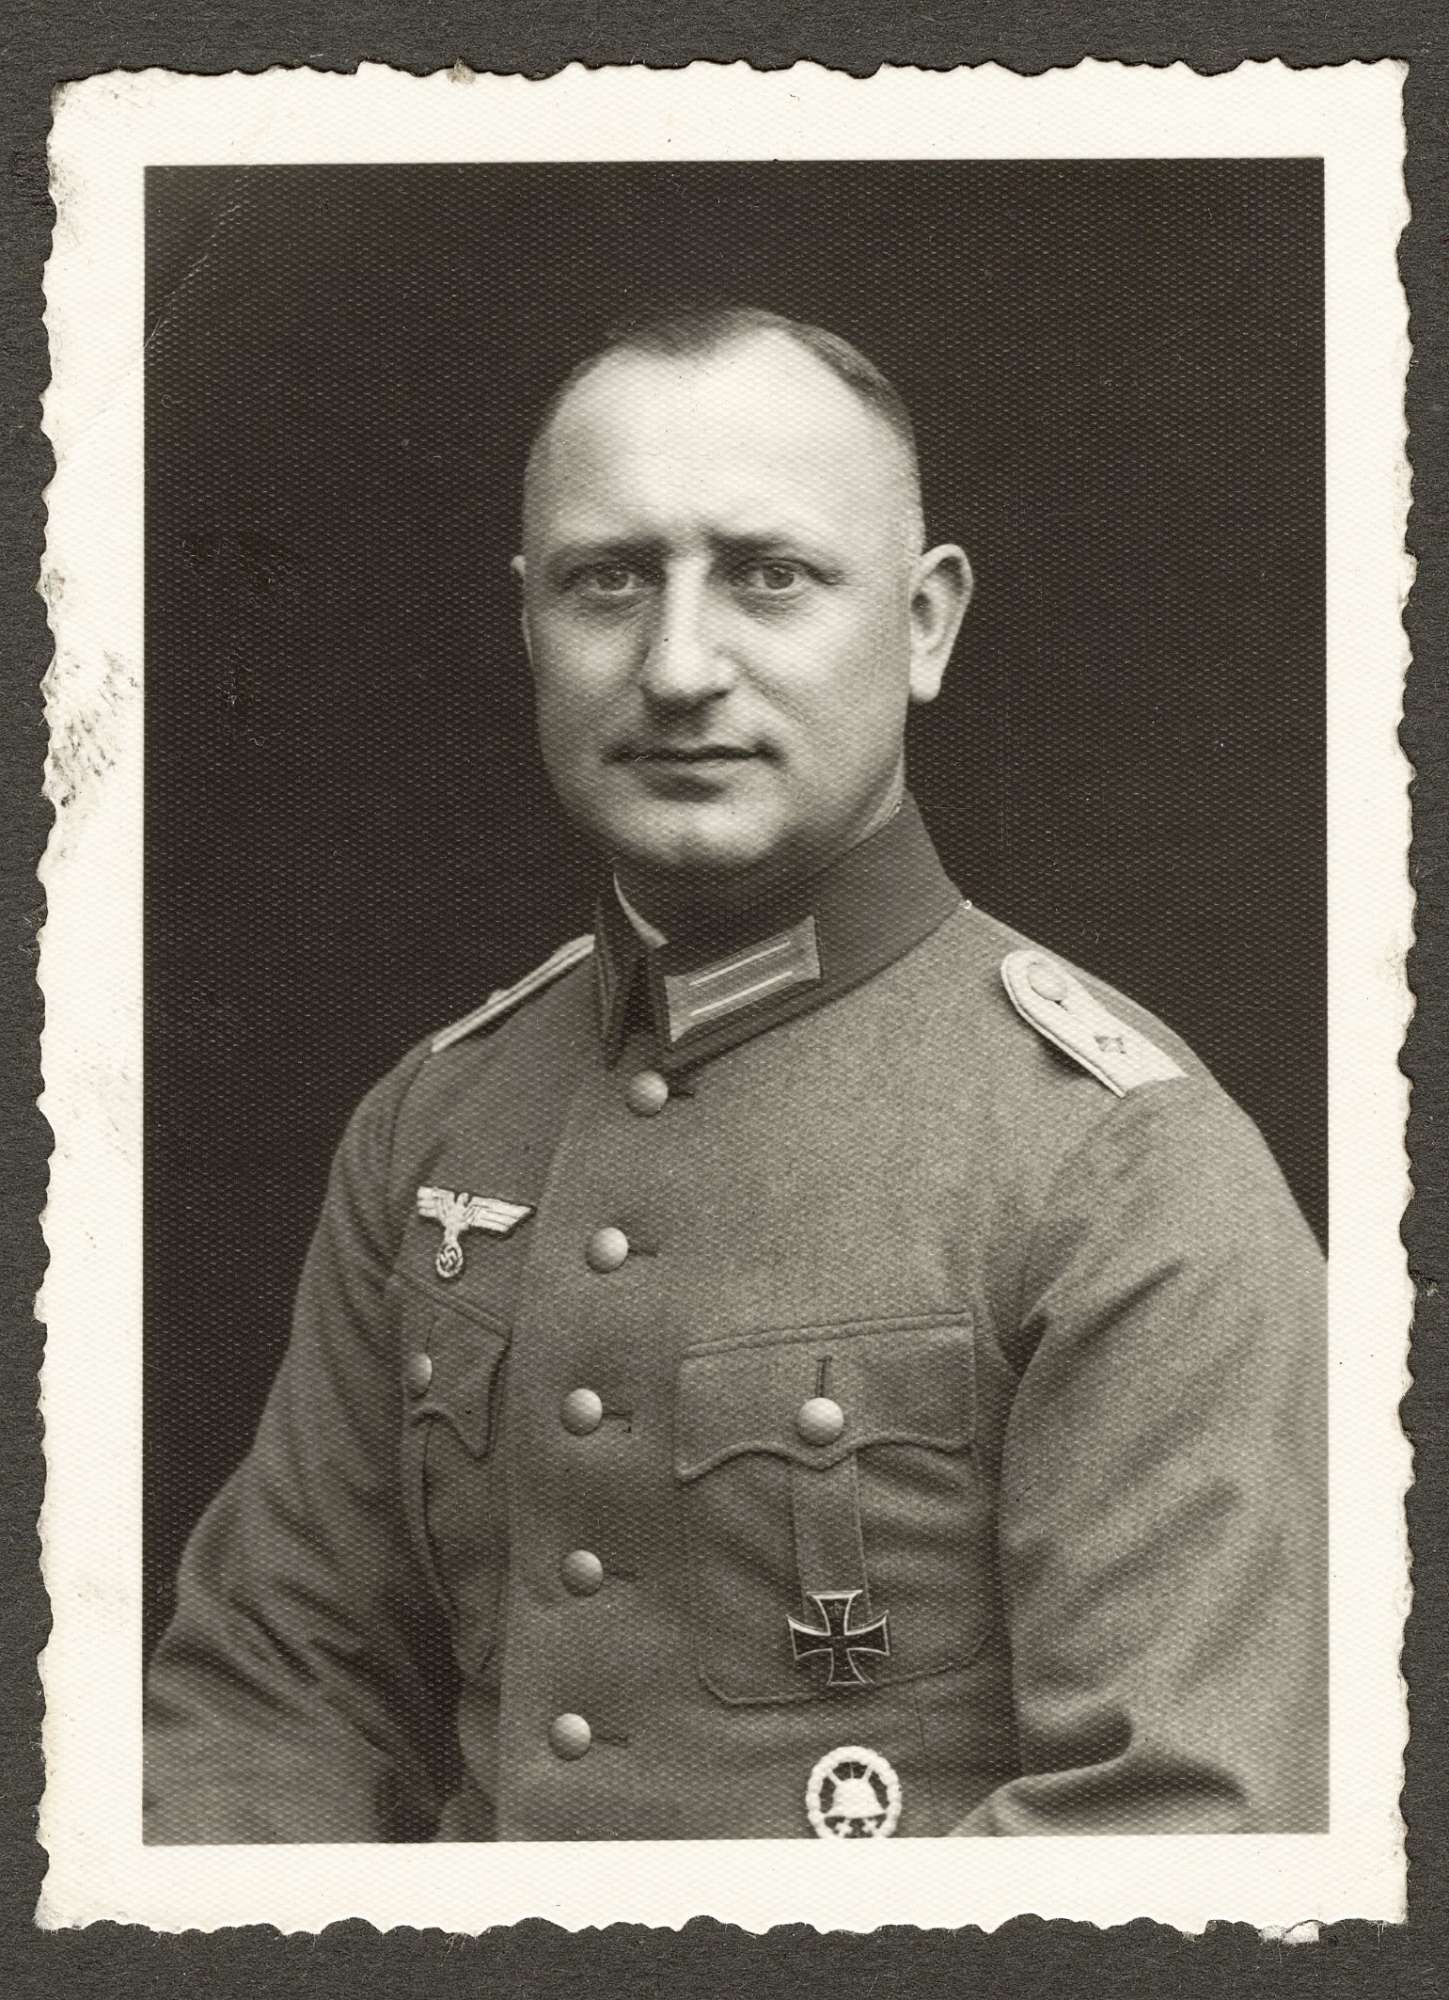 Baur, Eugen, Bild 1